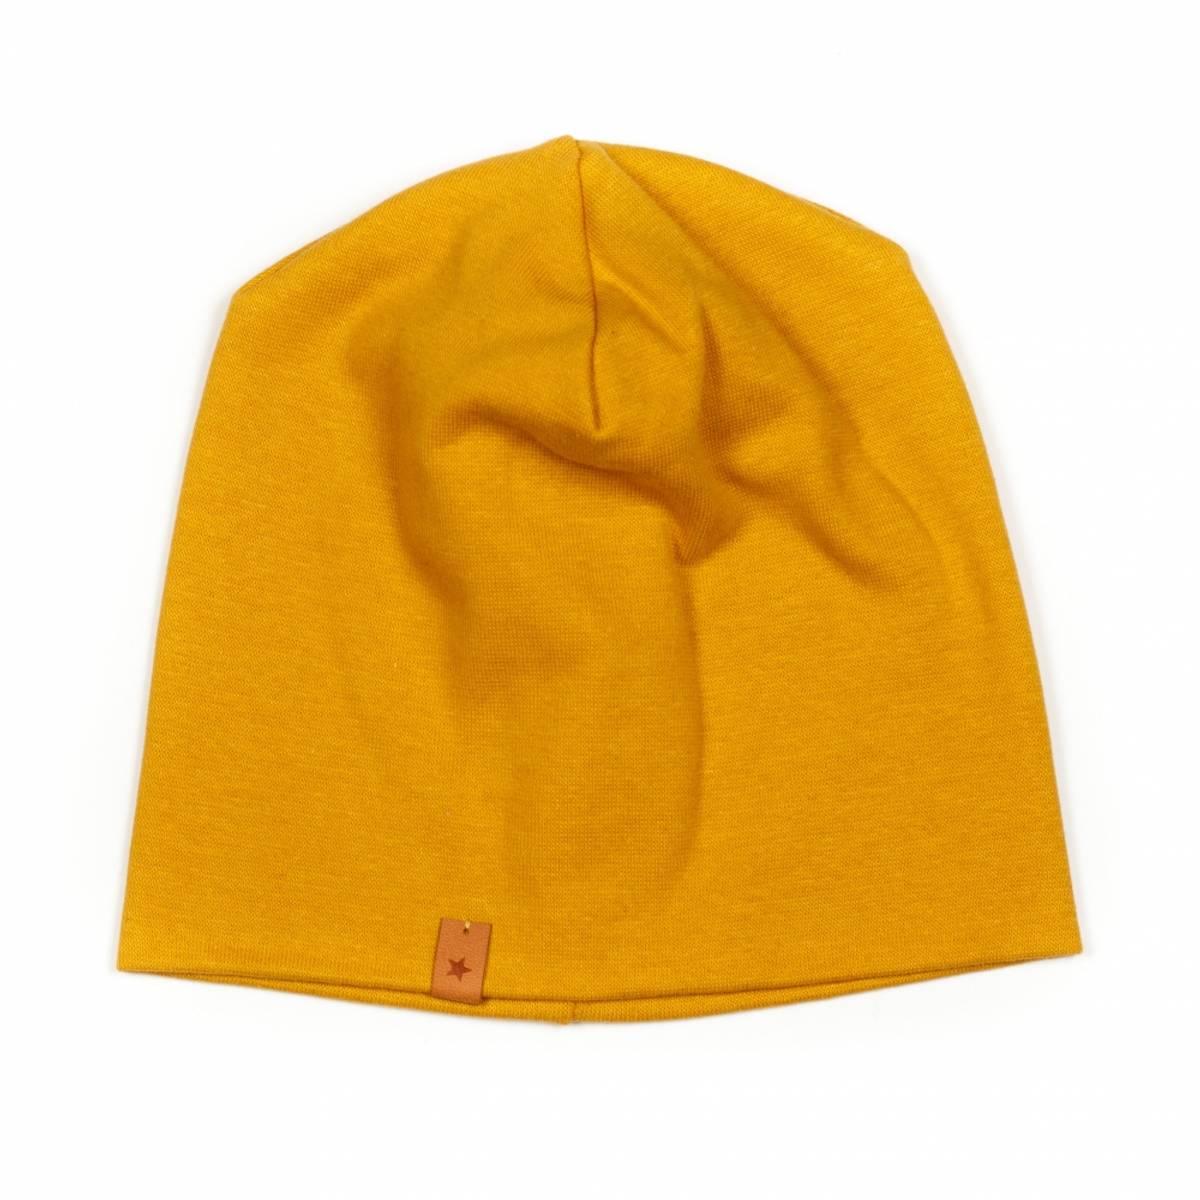 HUTTELiHUT Dapper hiphop hut - mustard